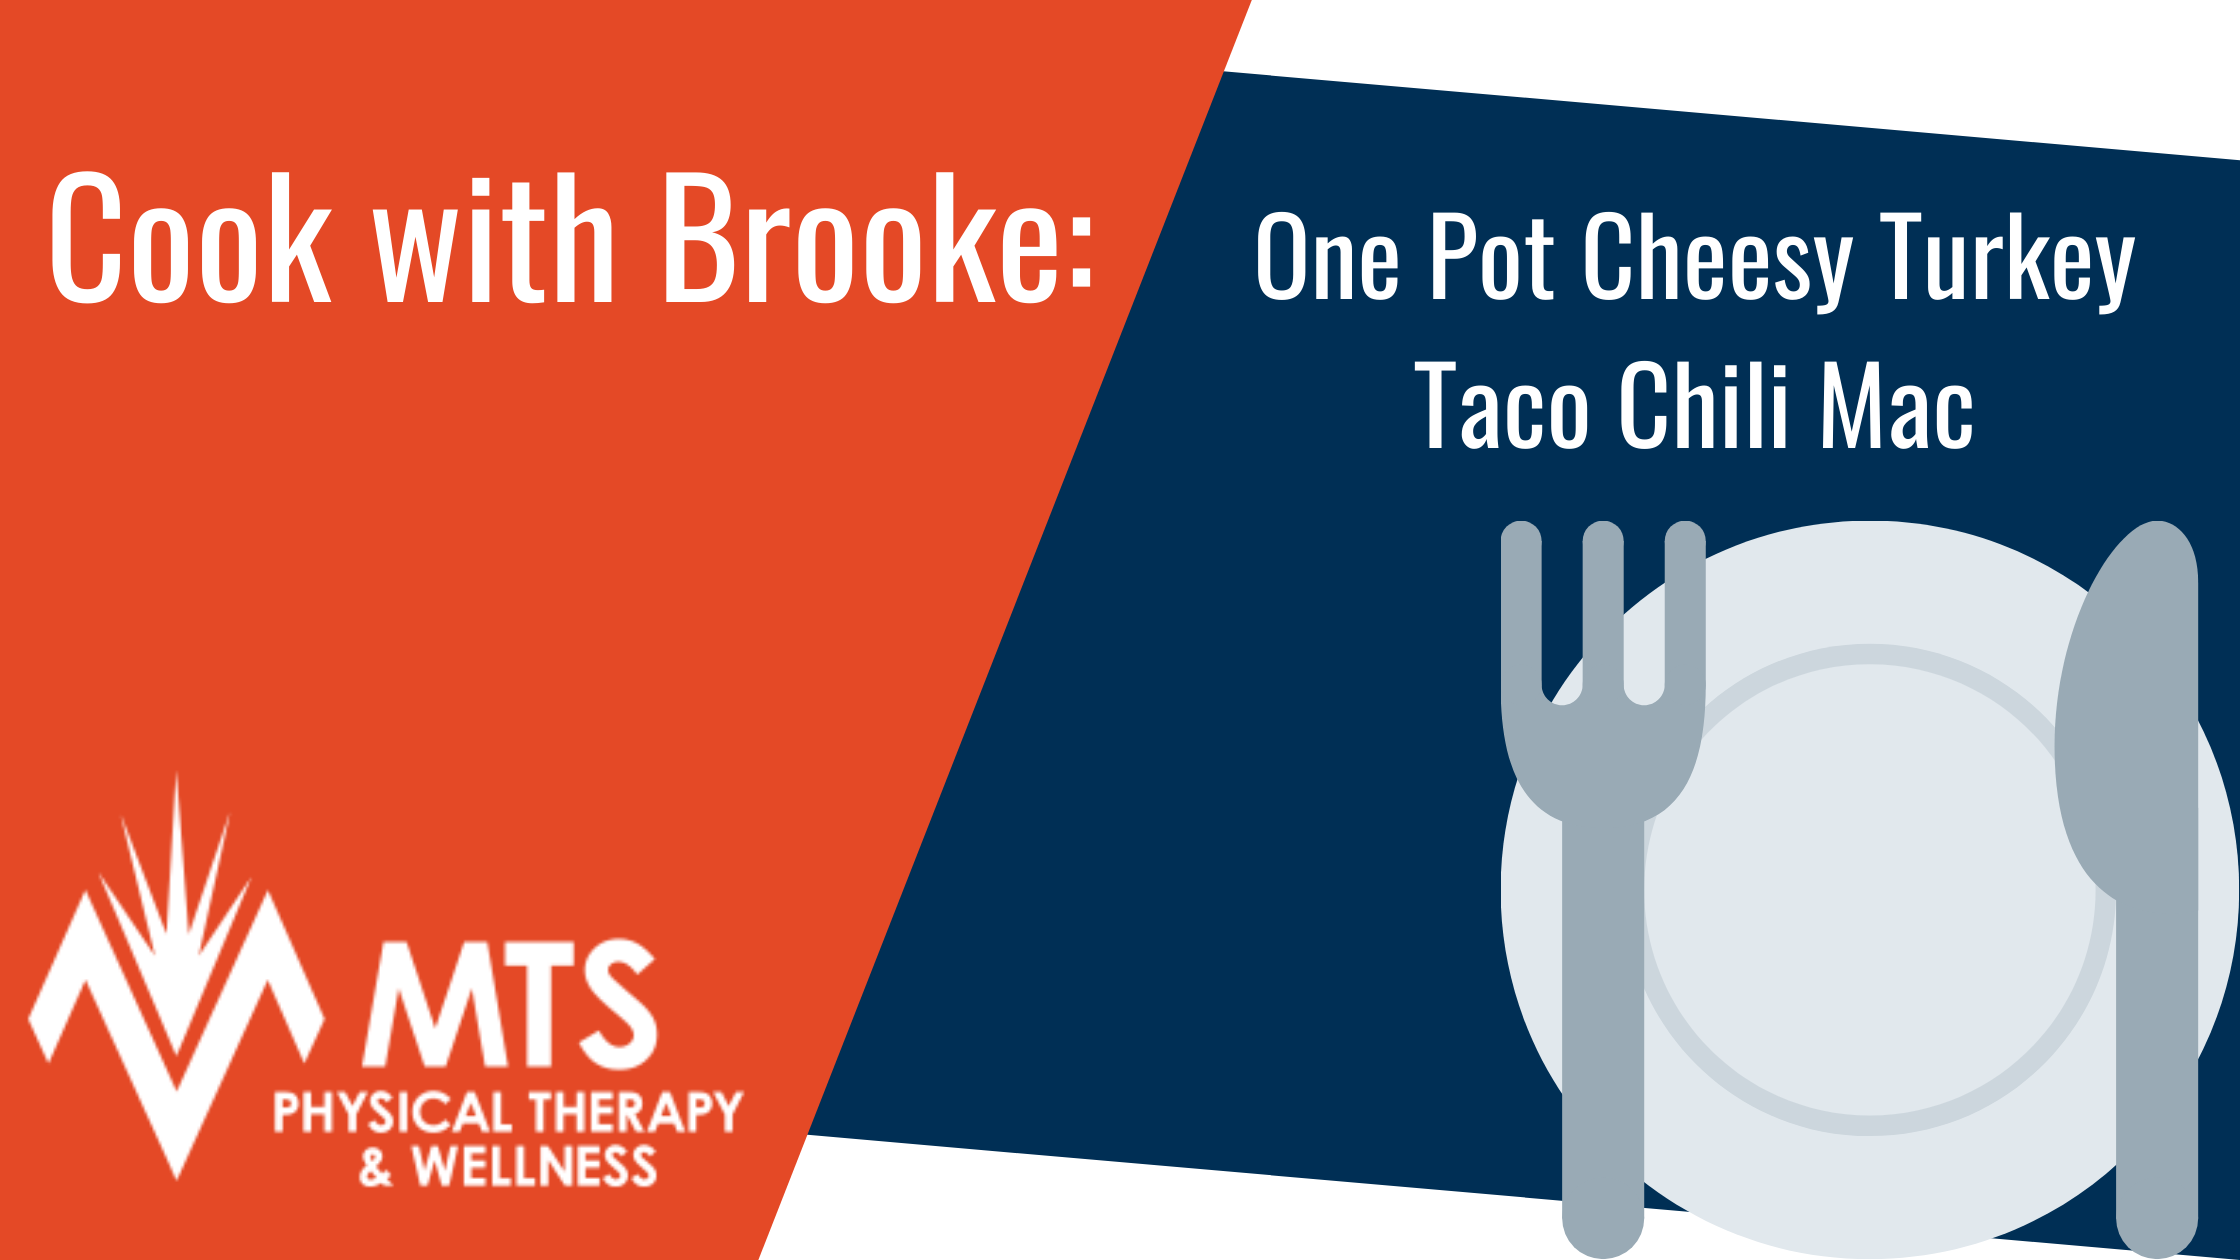 Cook with Brooke: One Pot Cheesy Turkey Taco Chili Mac